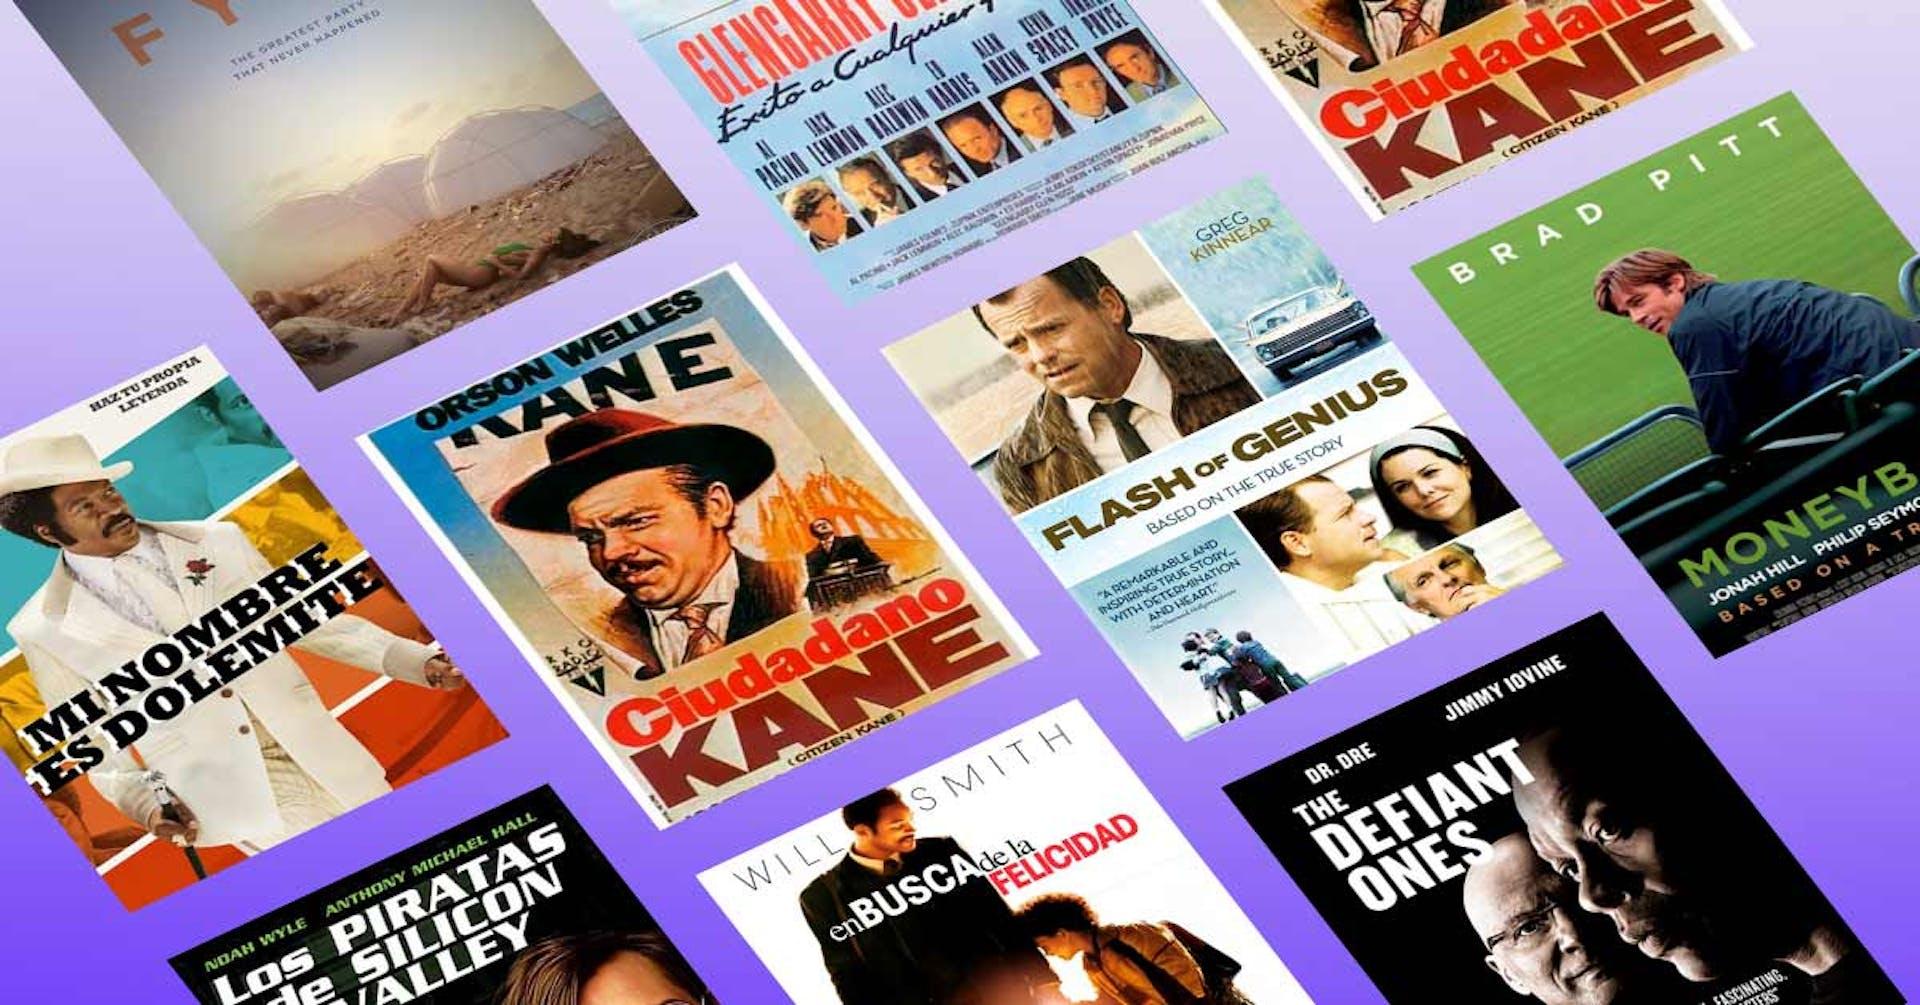 10 películas de emprendedores que te inspirarán a alcanzar el éxito